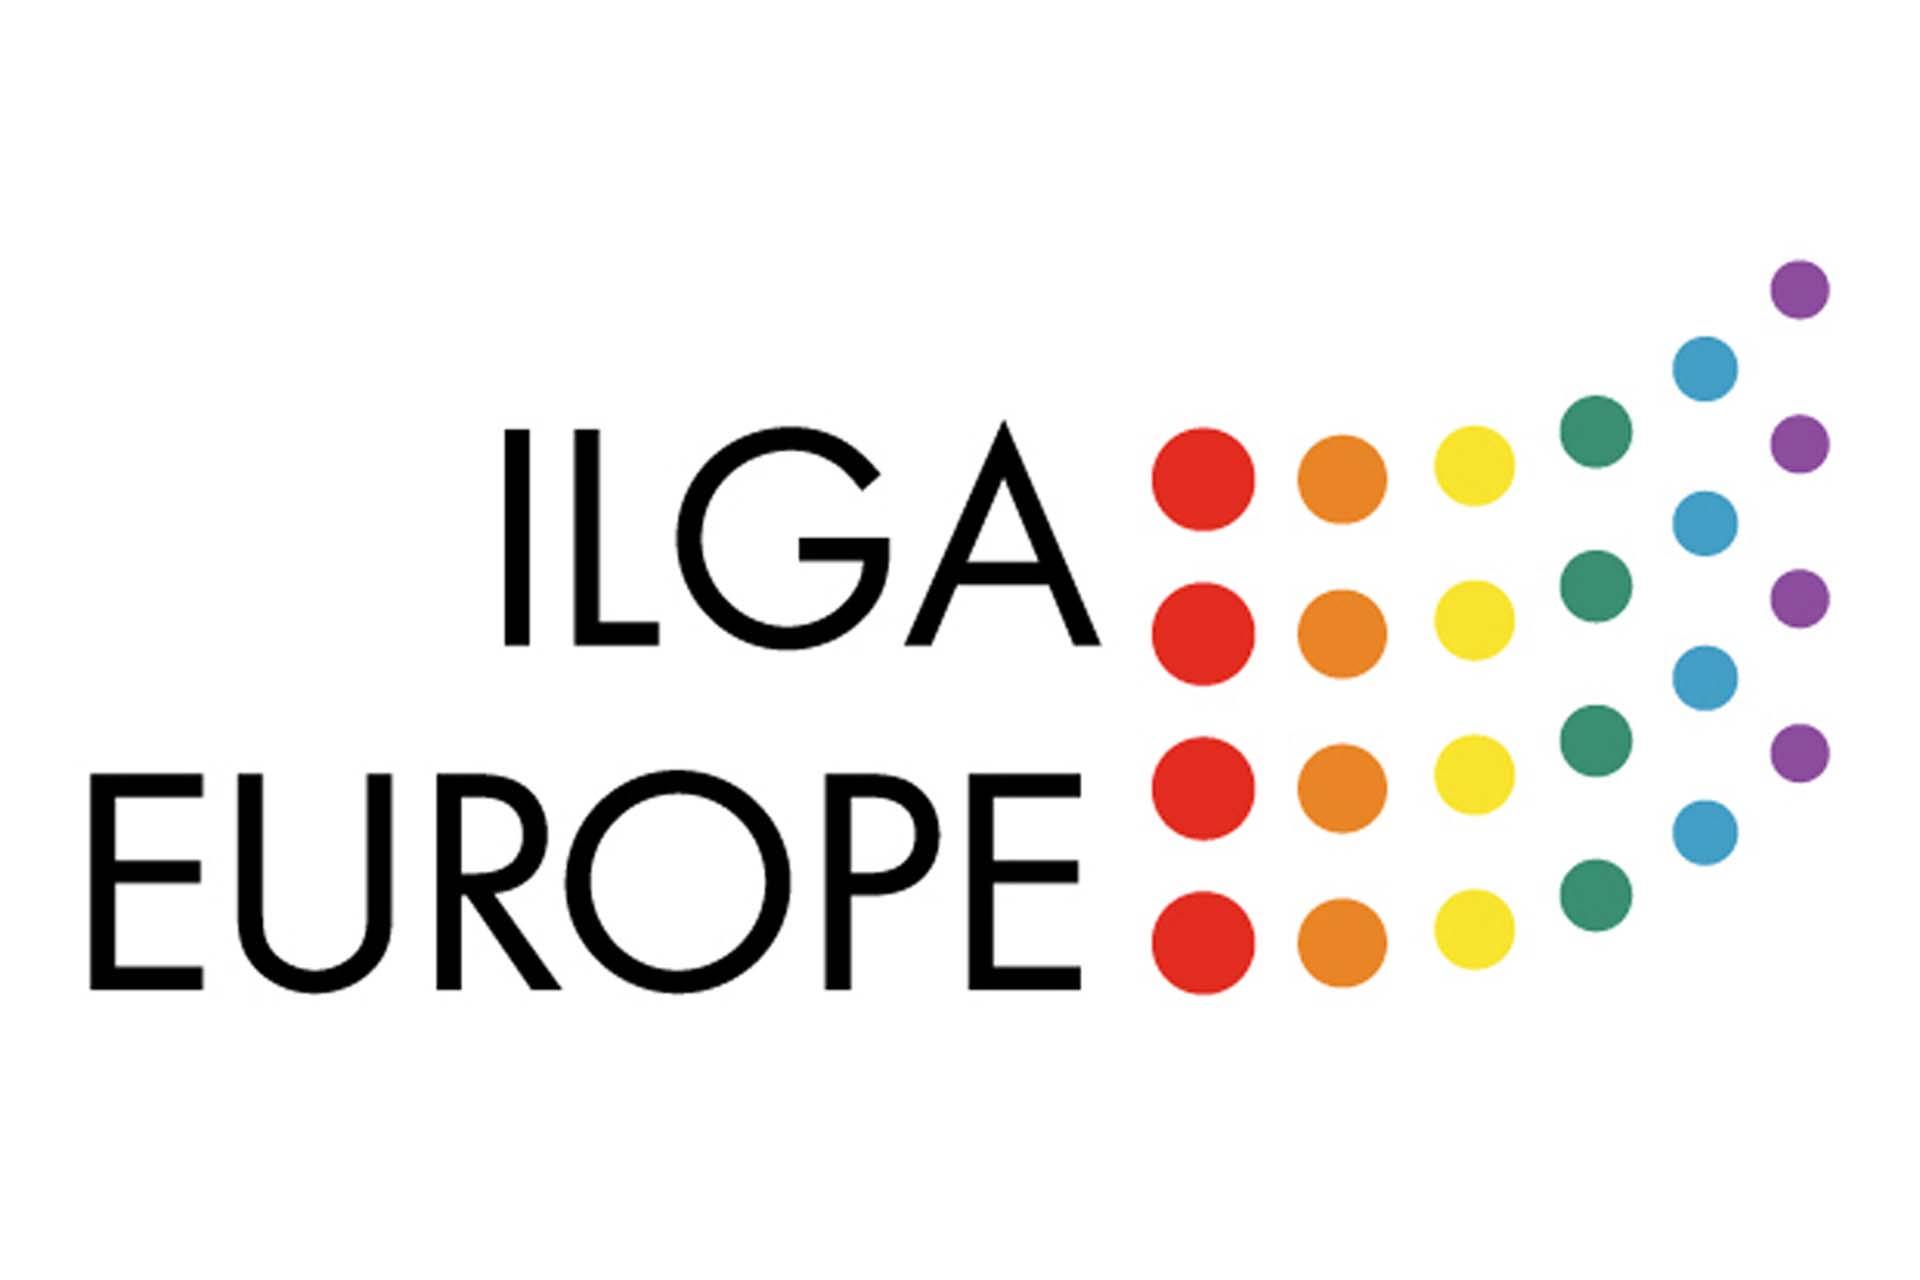 ILGA Europe